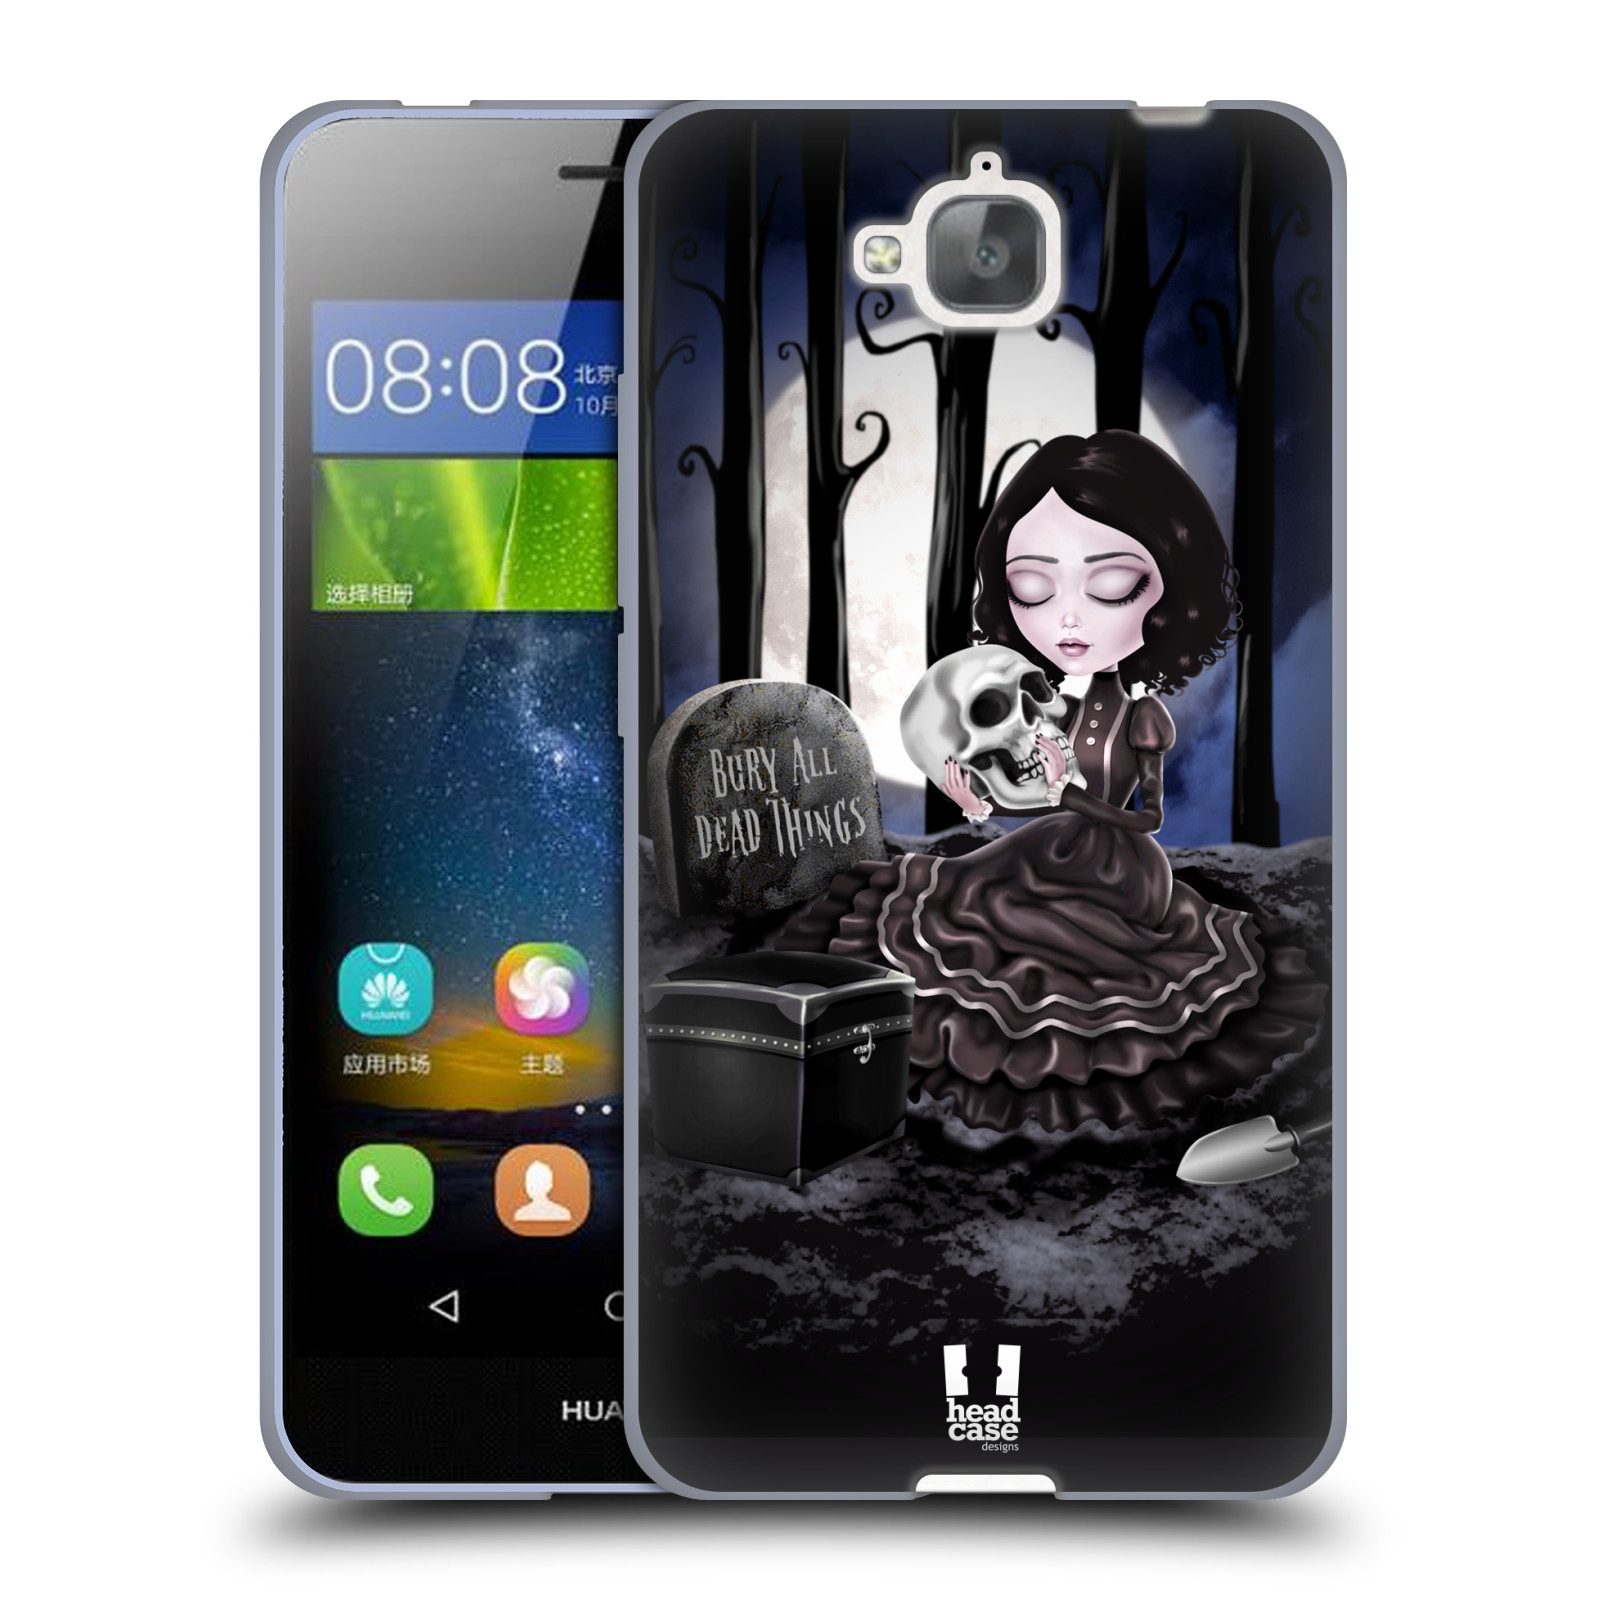 Silikonové pouzdro na mobil Huawei Y6 Pro Dual Sim HEAD CASE MACABRE HŘBITOV